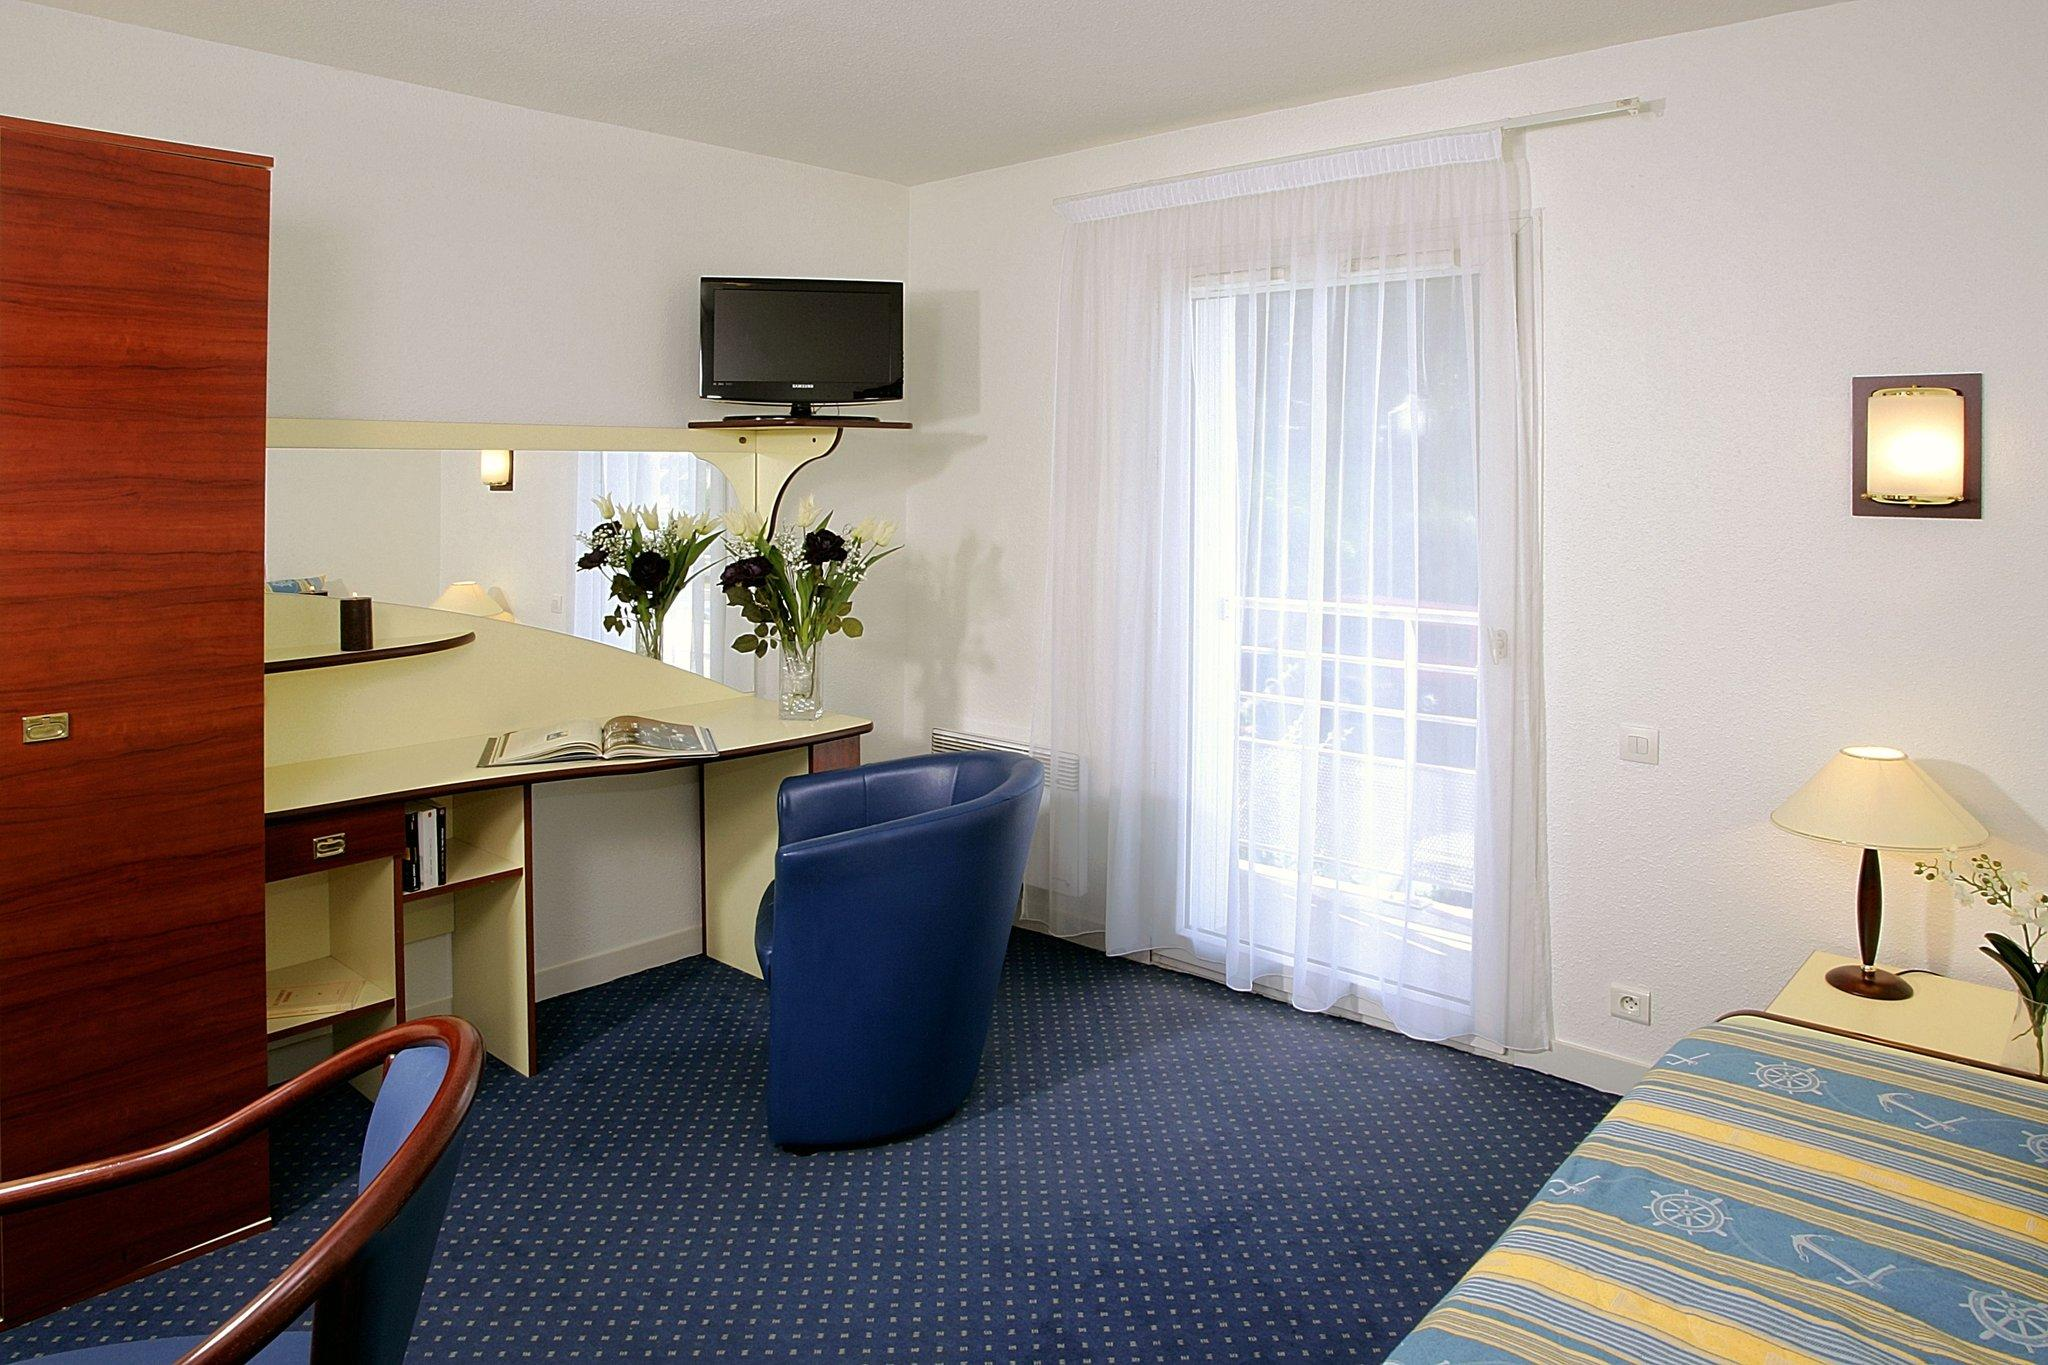 Logo brest long appart 39 hotel brest terres de france for Appart hotel pas cher